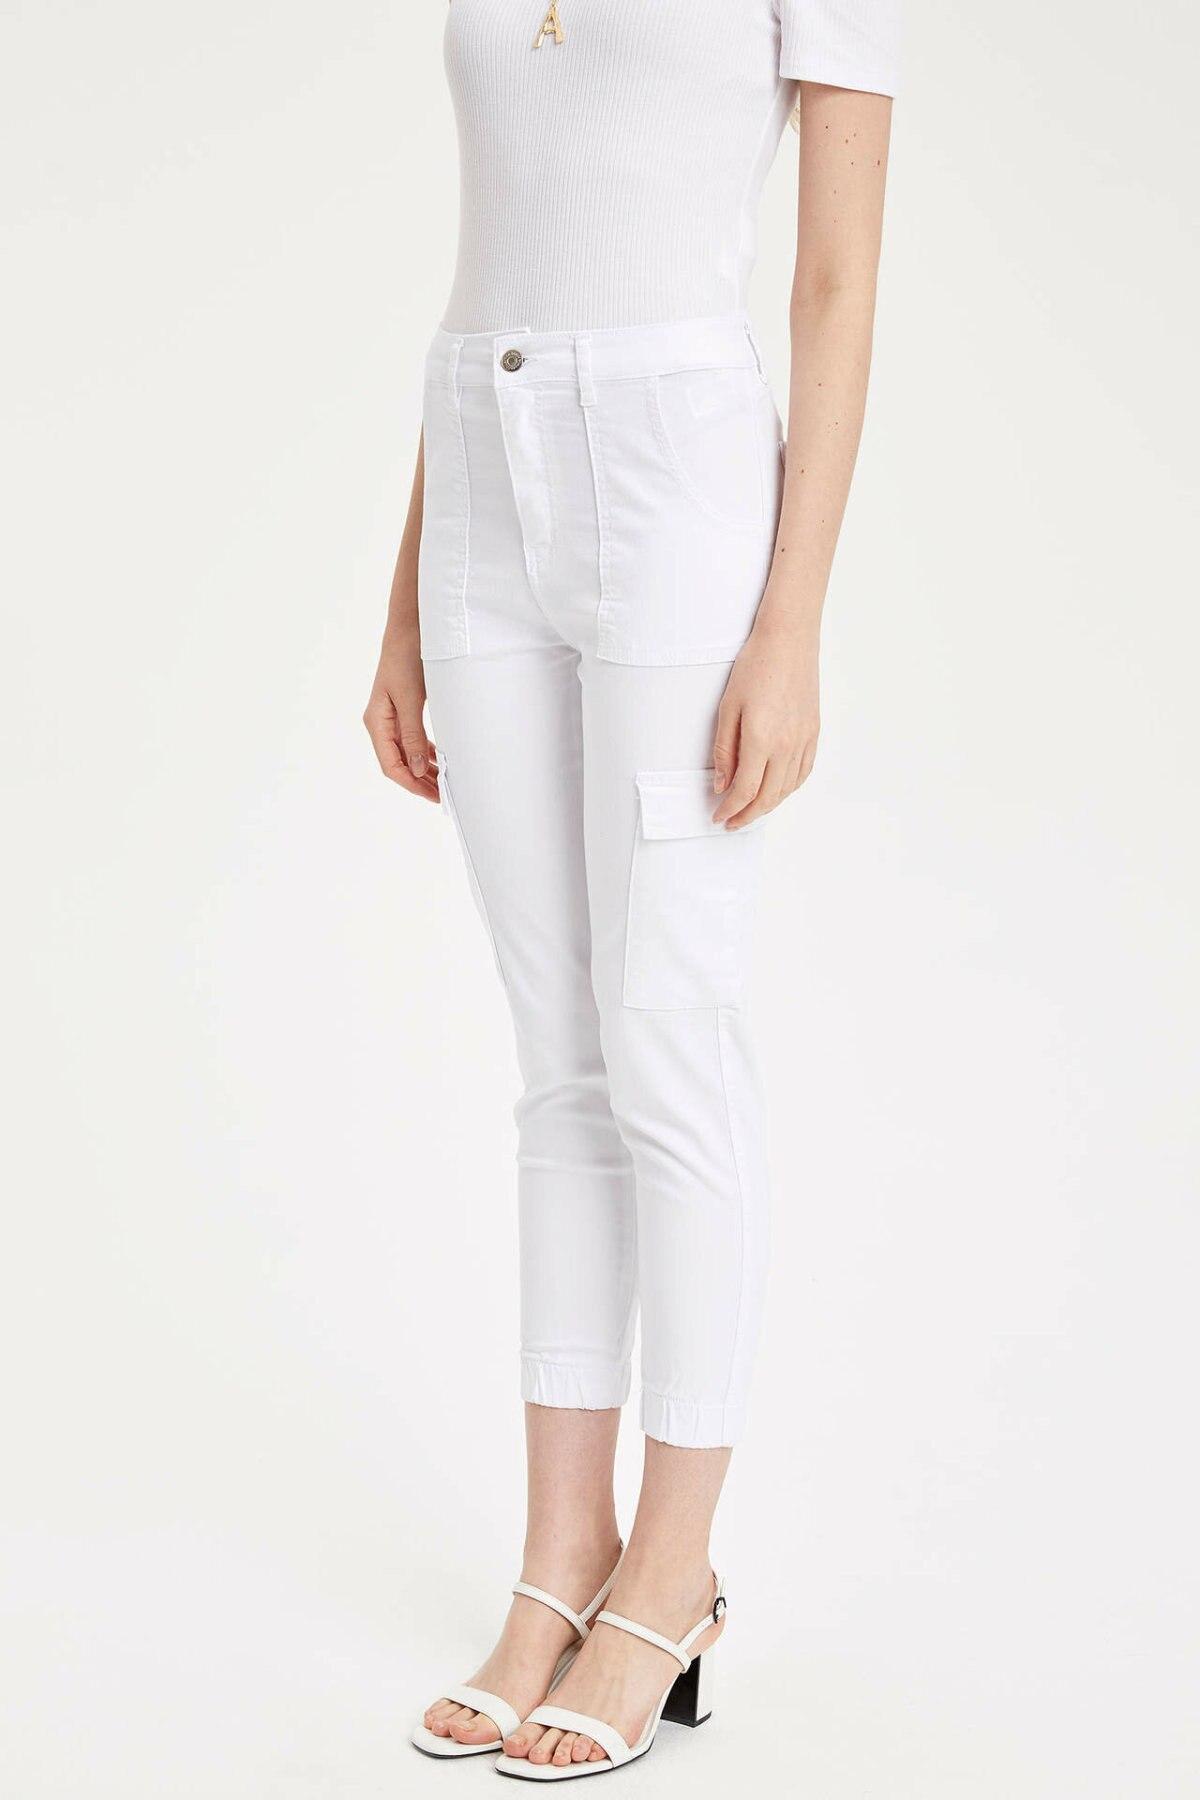 DeFacto Woman Summer White Skinny Pants Women Casual Ninth Pants Female Mid-waist Pocket Decors Bottoms Trousers-L5059AZ19SM